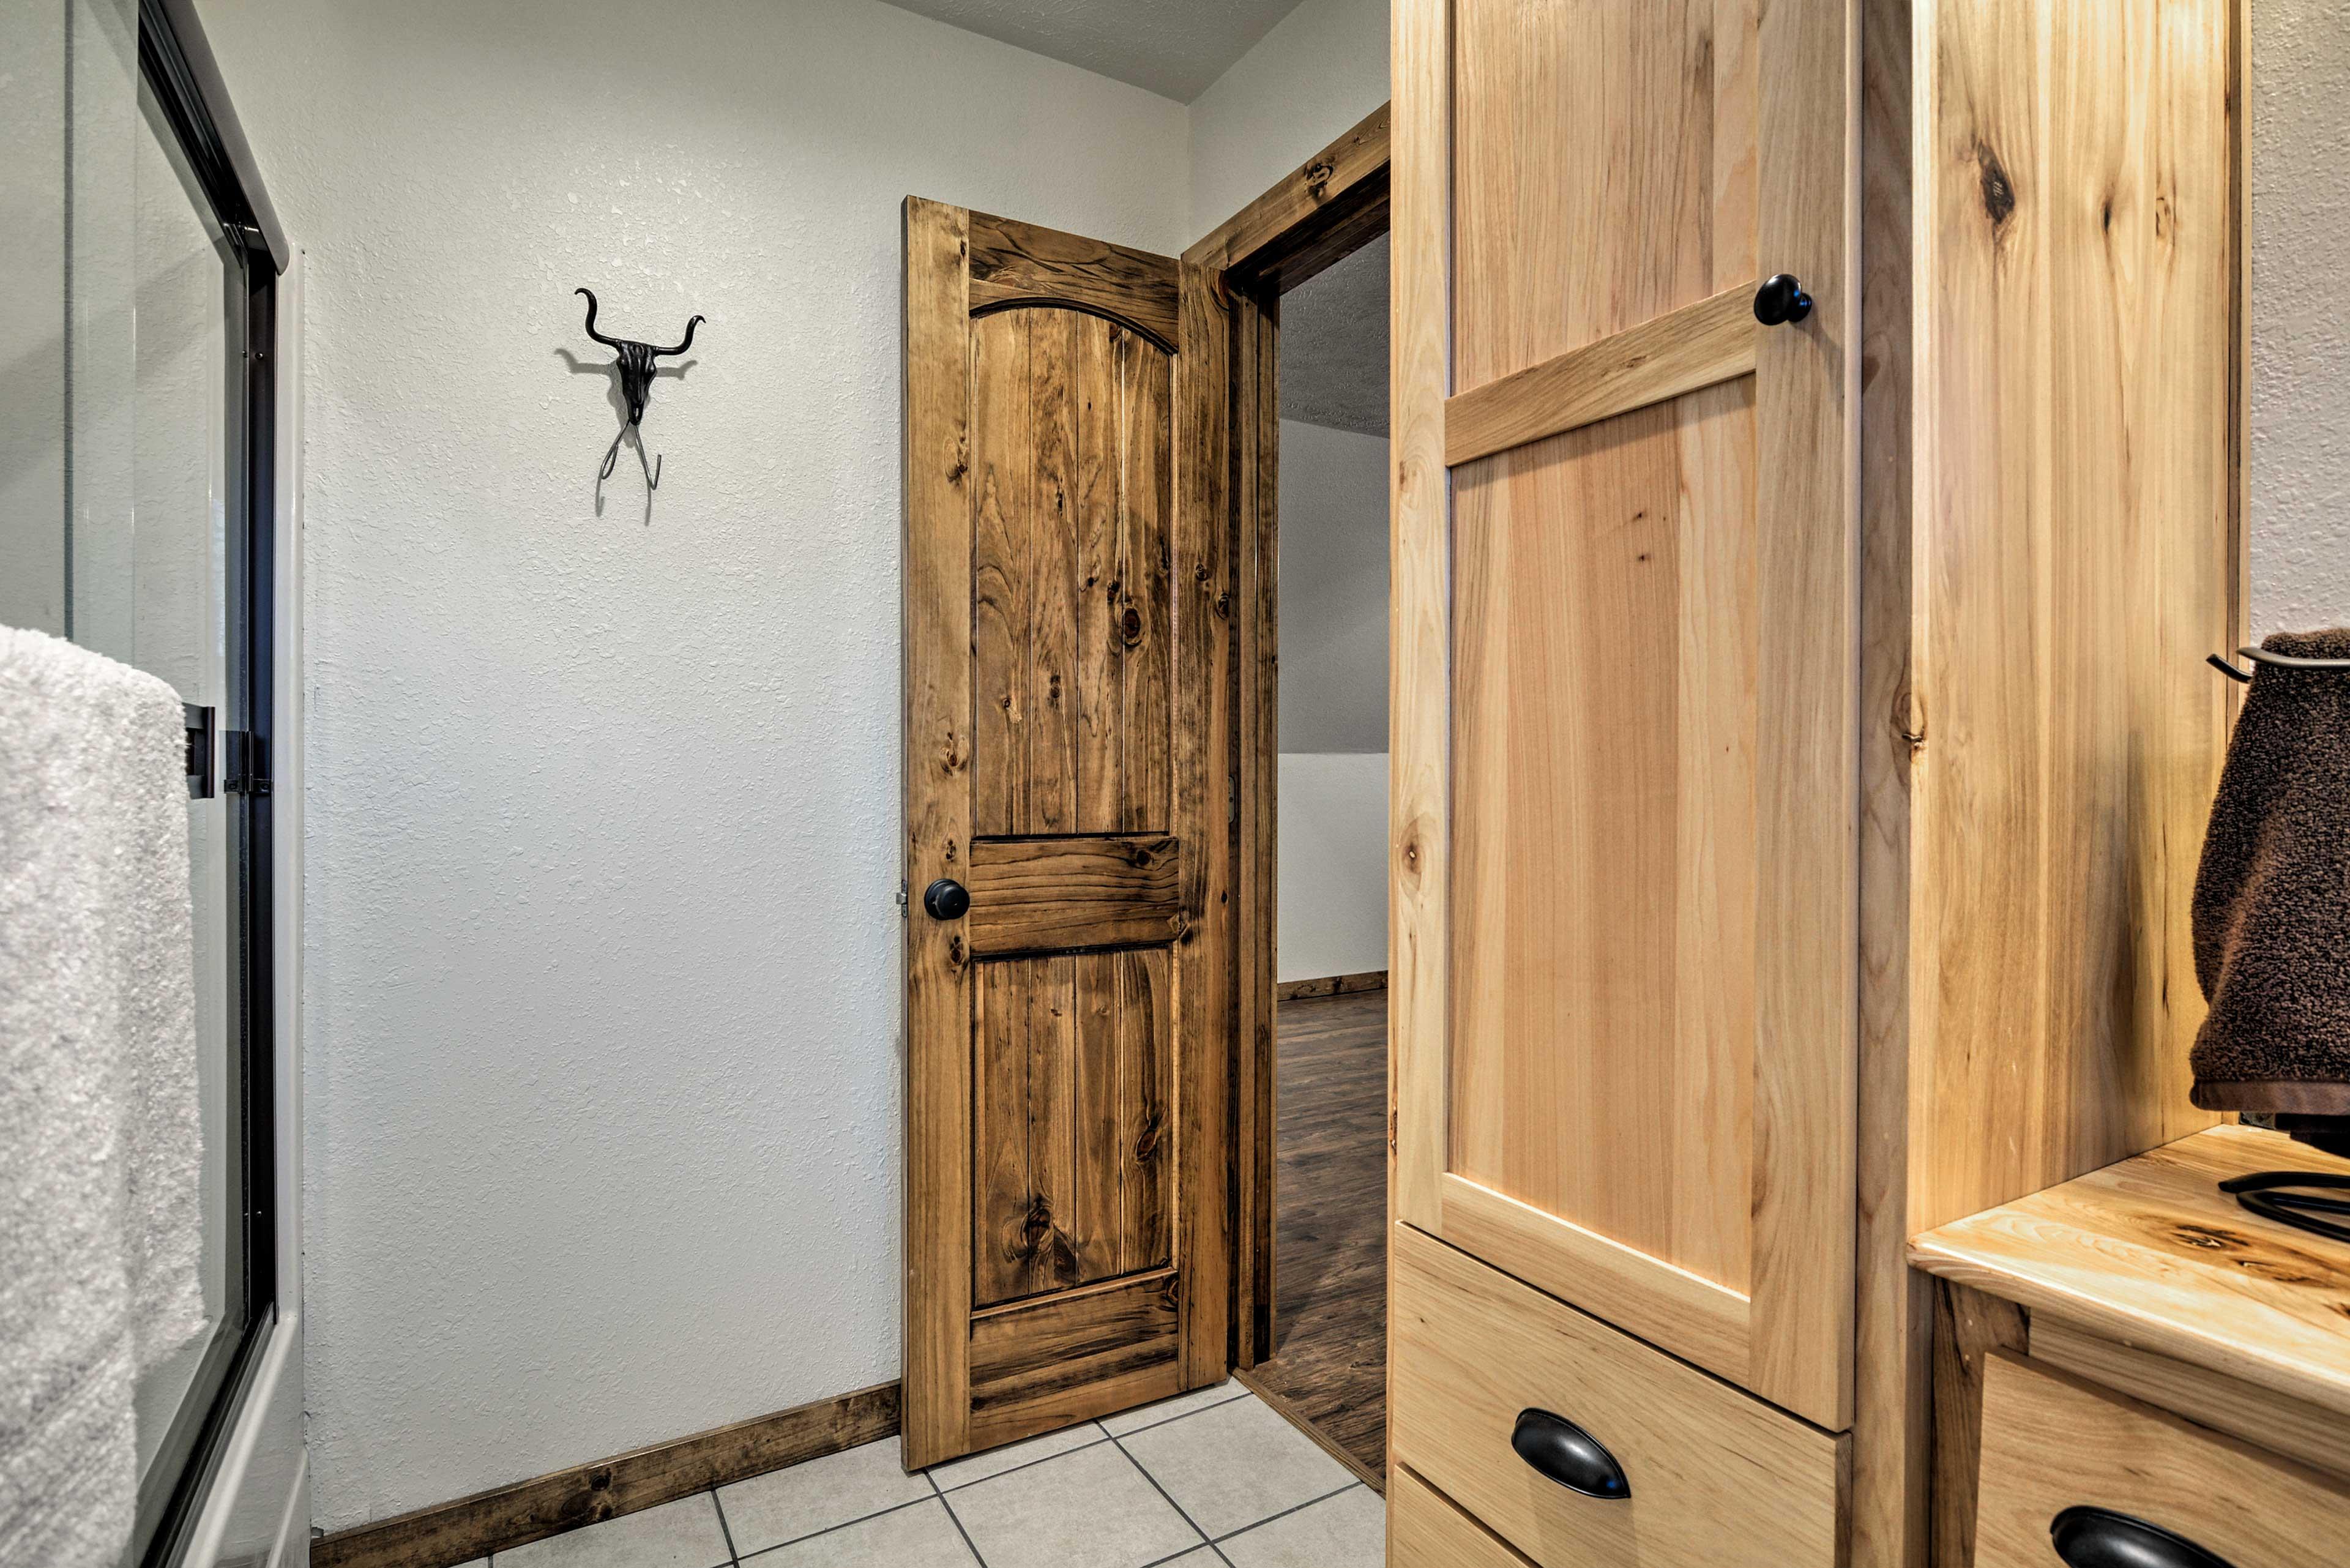 You'll love the convenience of an en-suite bathroom.